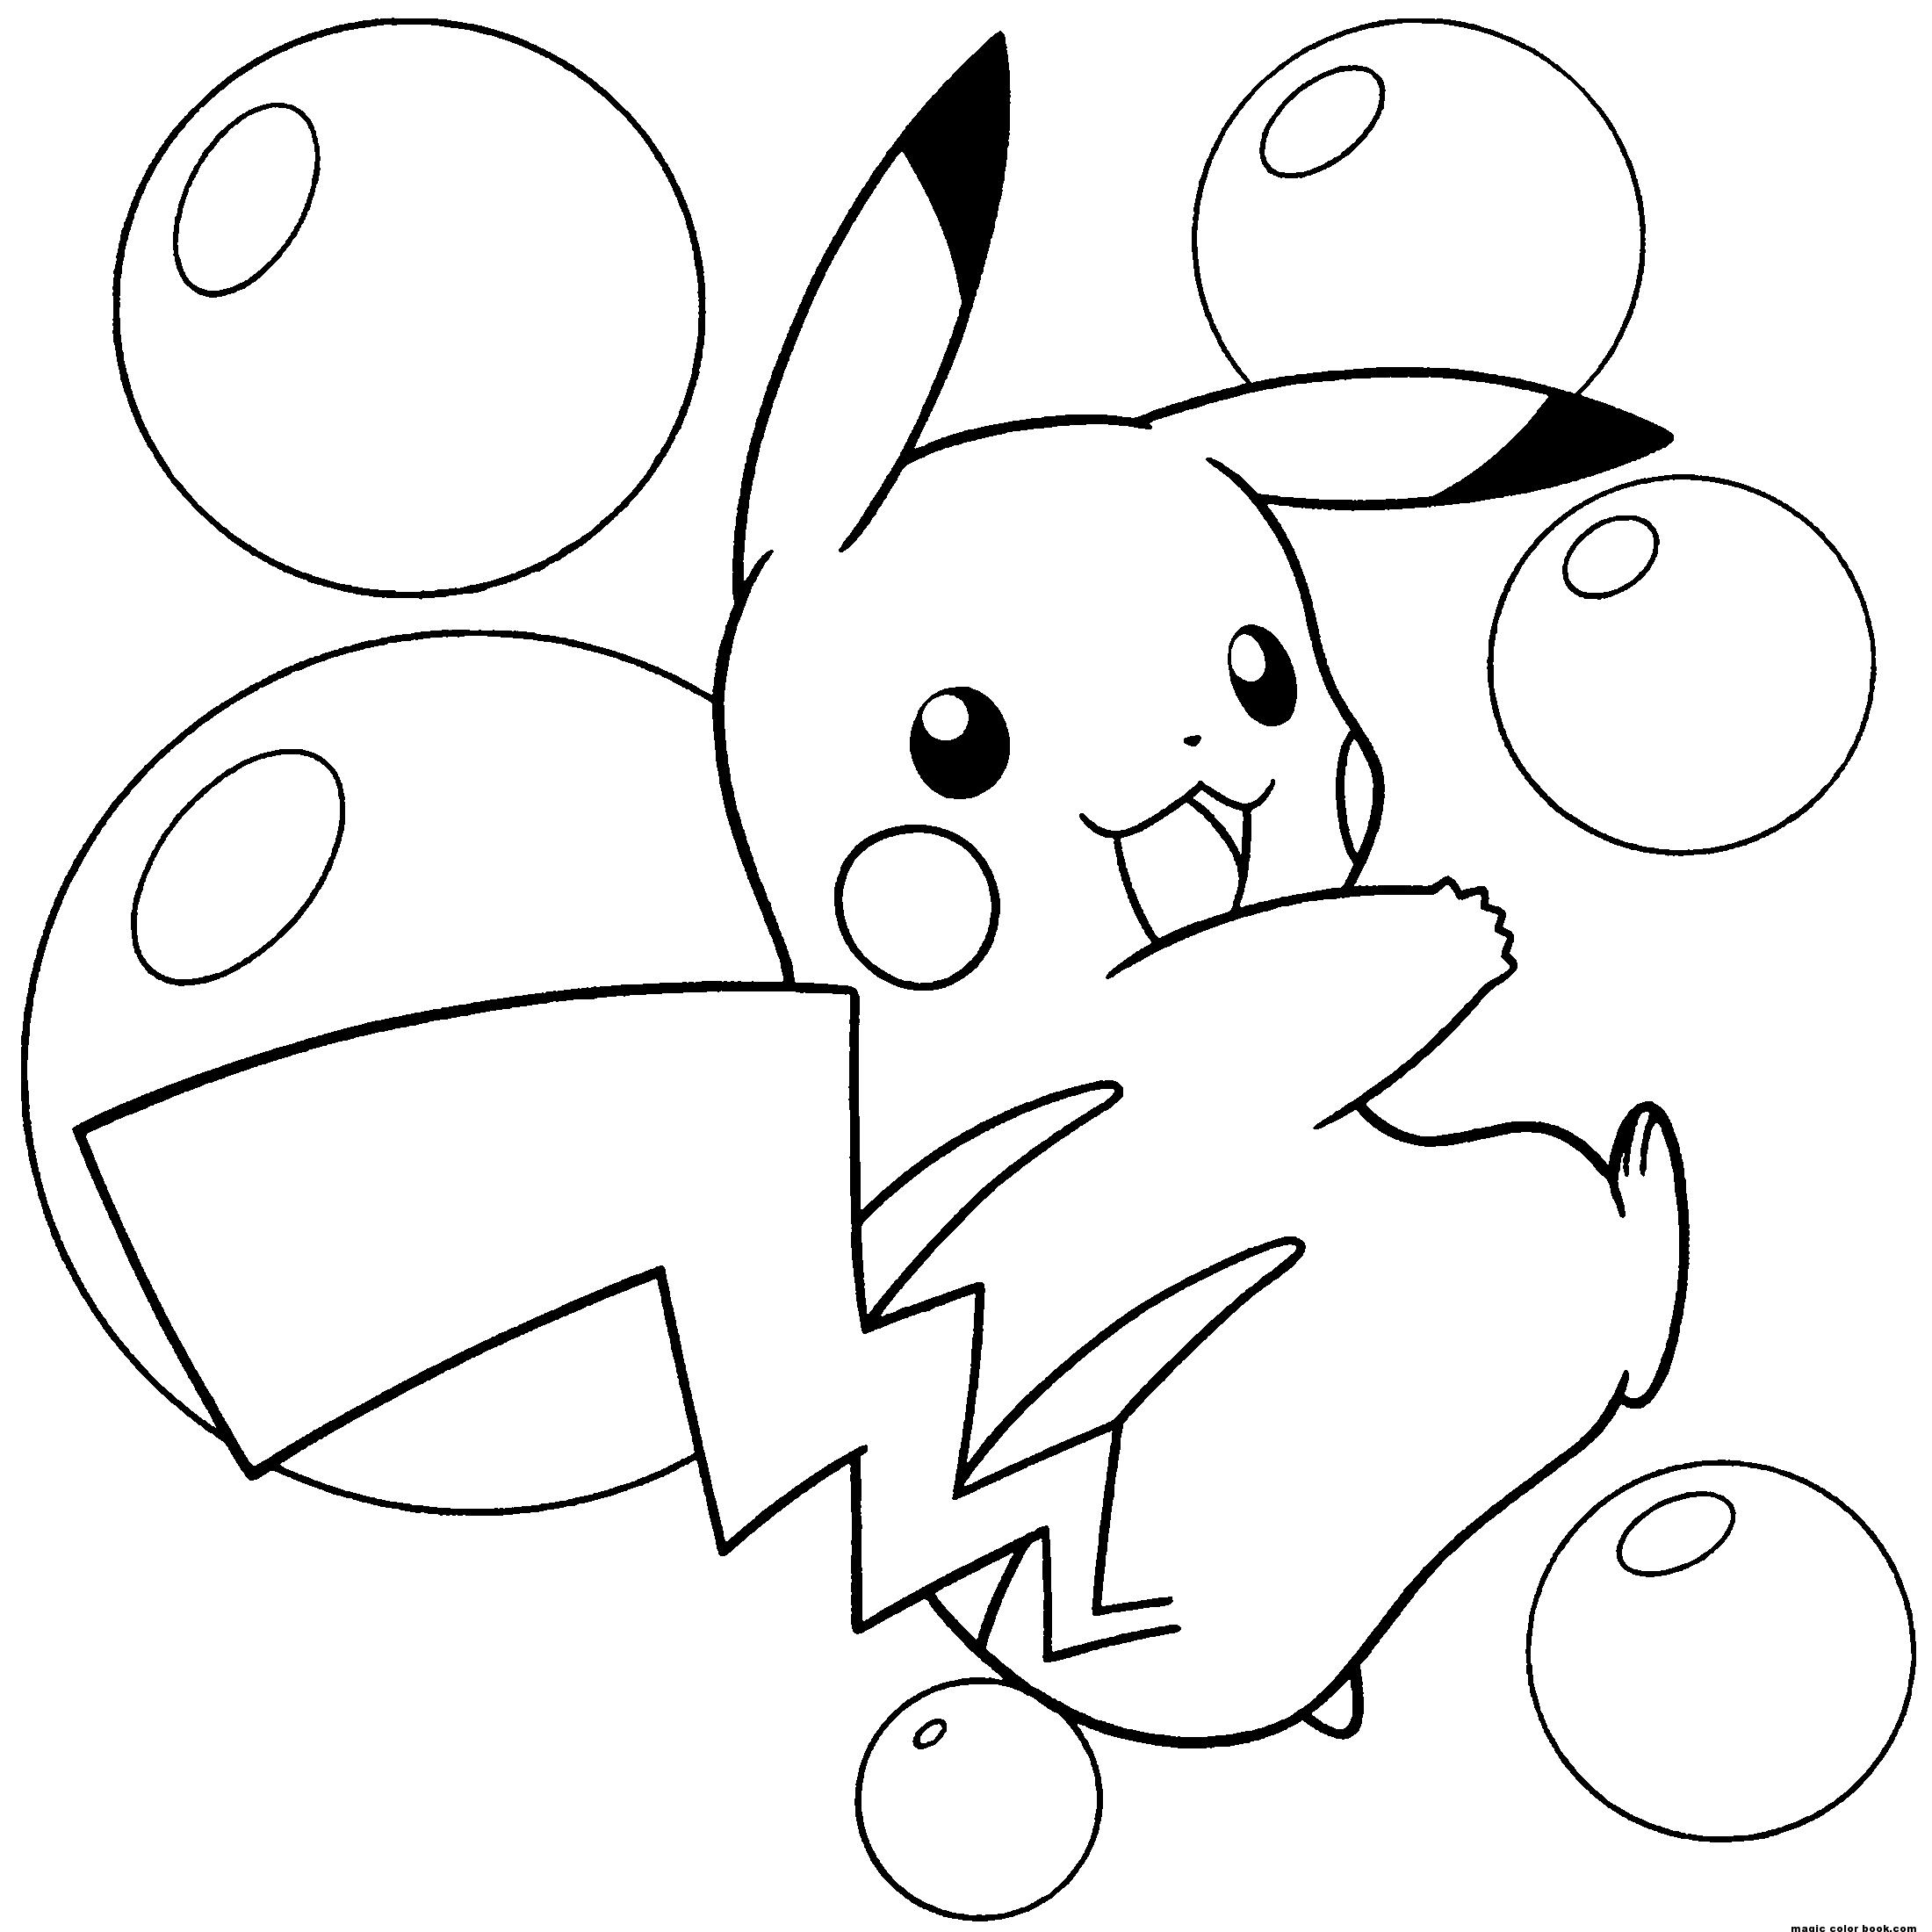 Coloriage pikachu gratuit dessin a imprimer 17